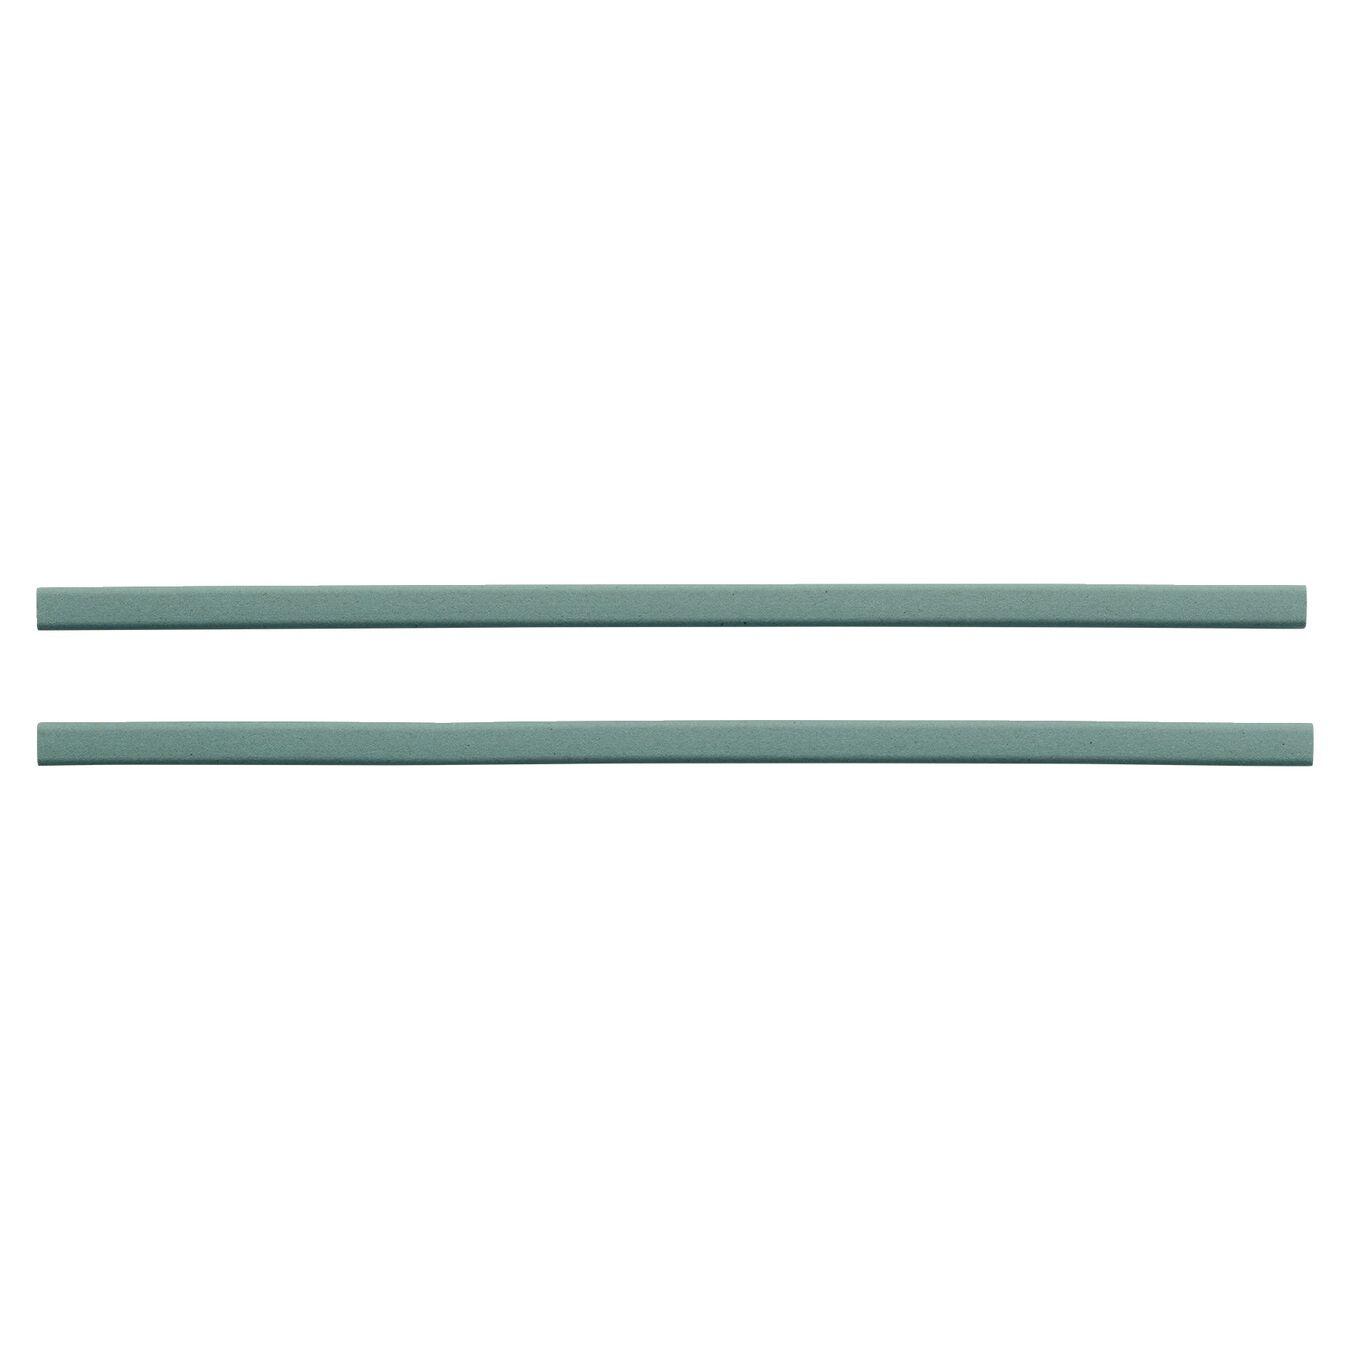 Sharpening rod, 2 cm | green | Ceramic,,large 1